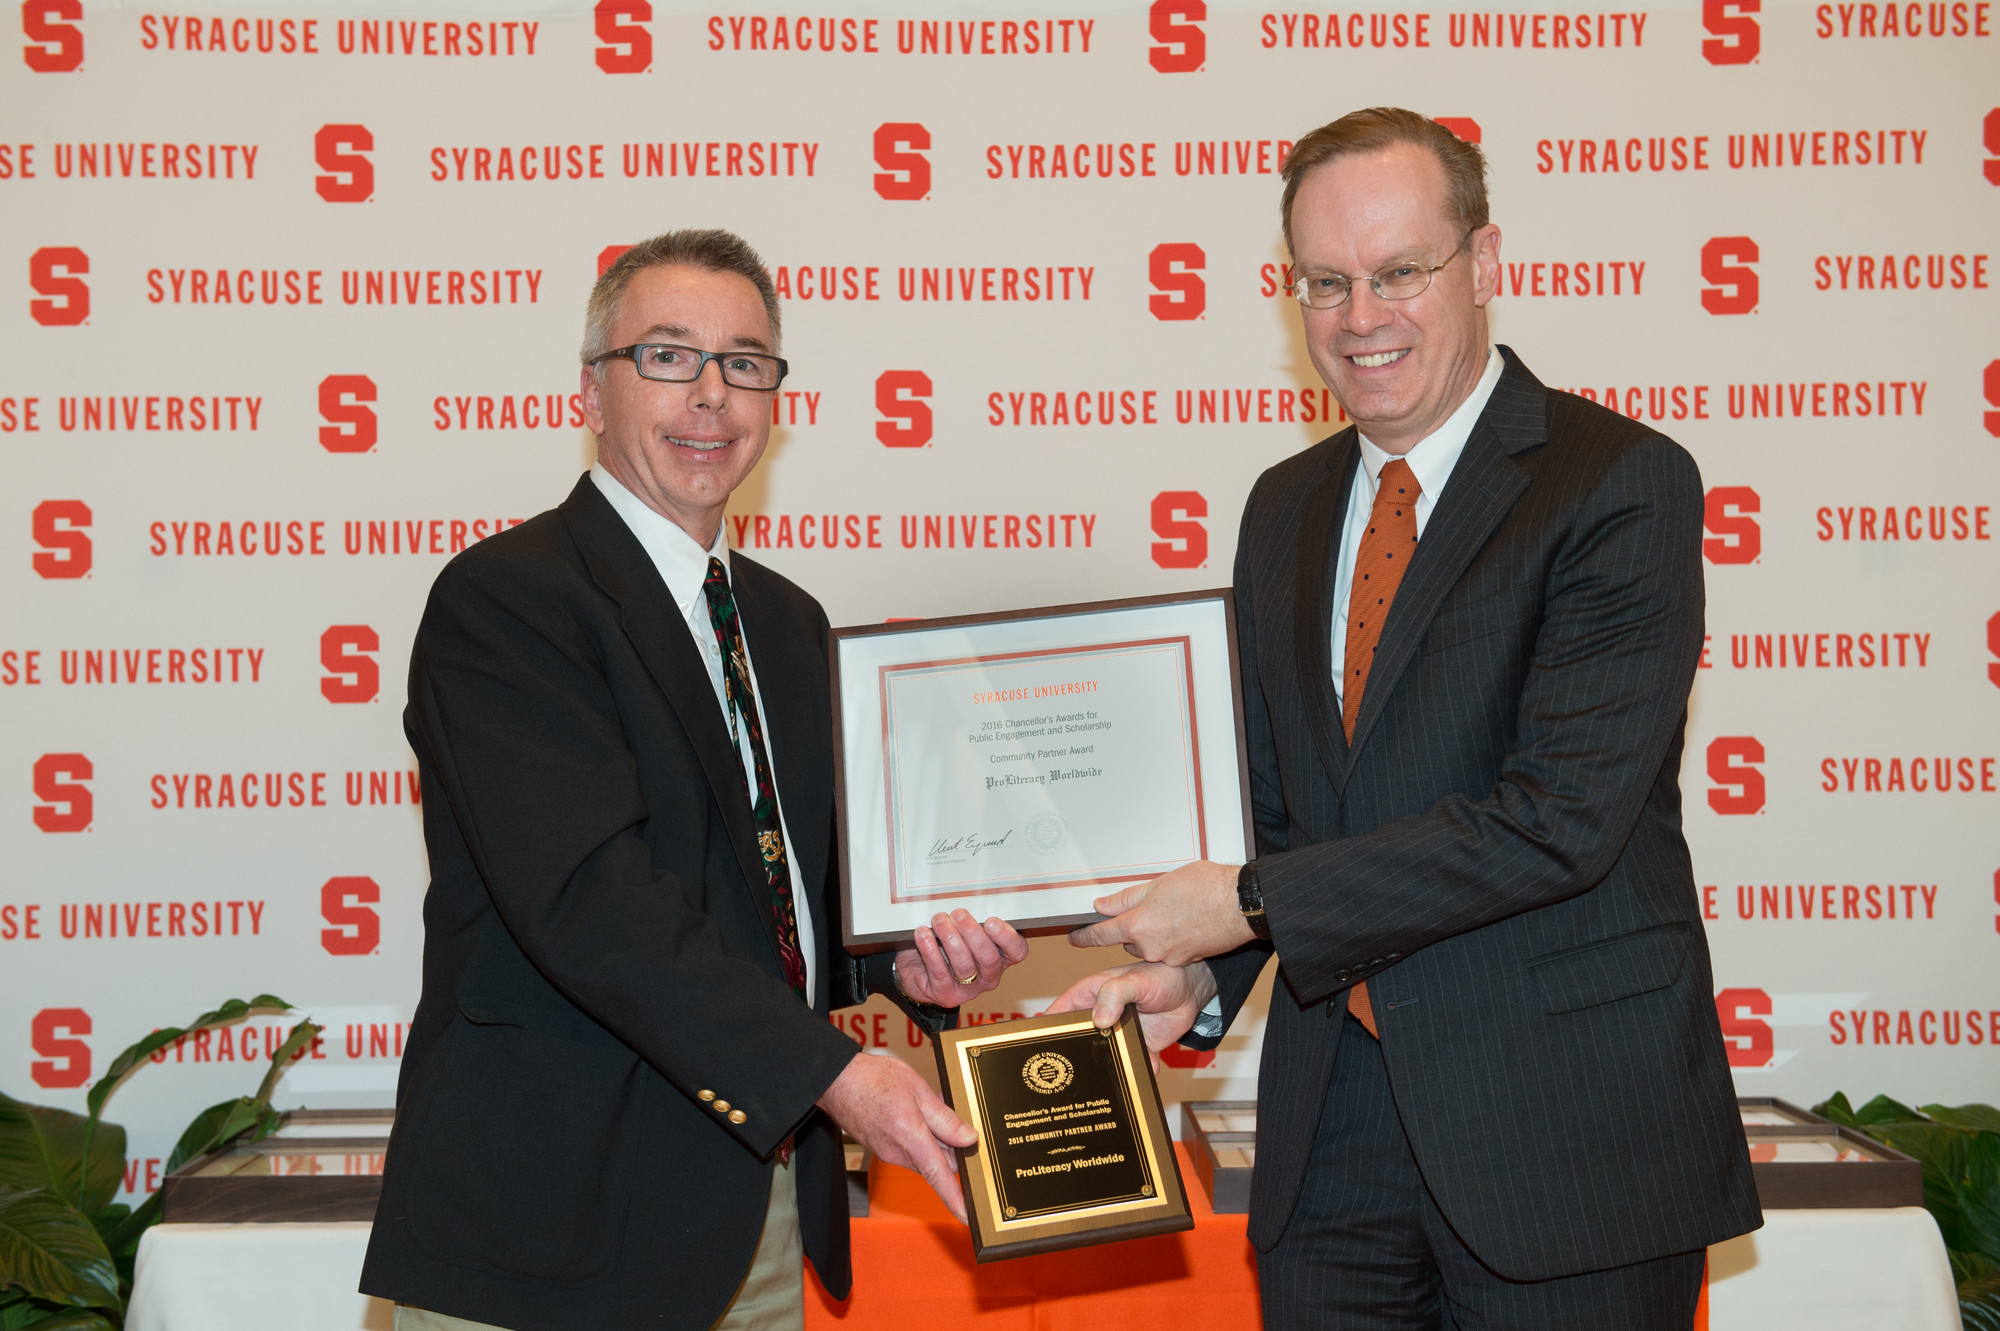 Syracuse University Honors ProLiteracy With 2016 Community Partner Award